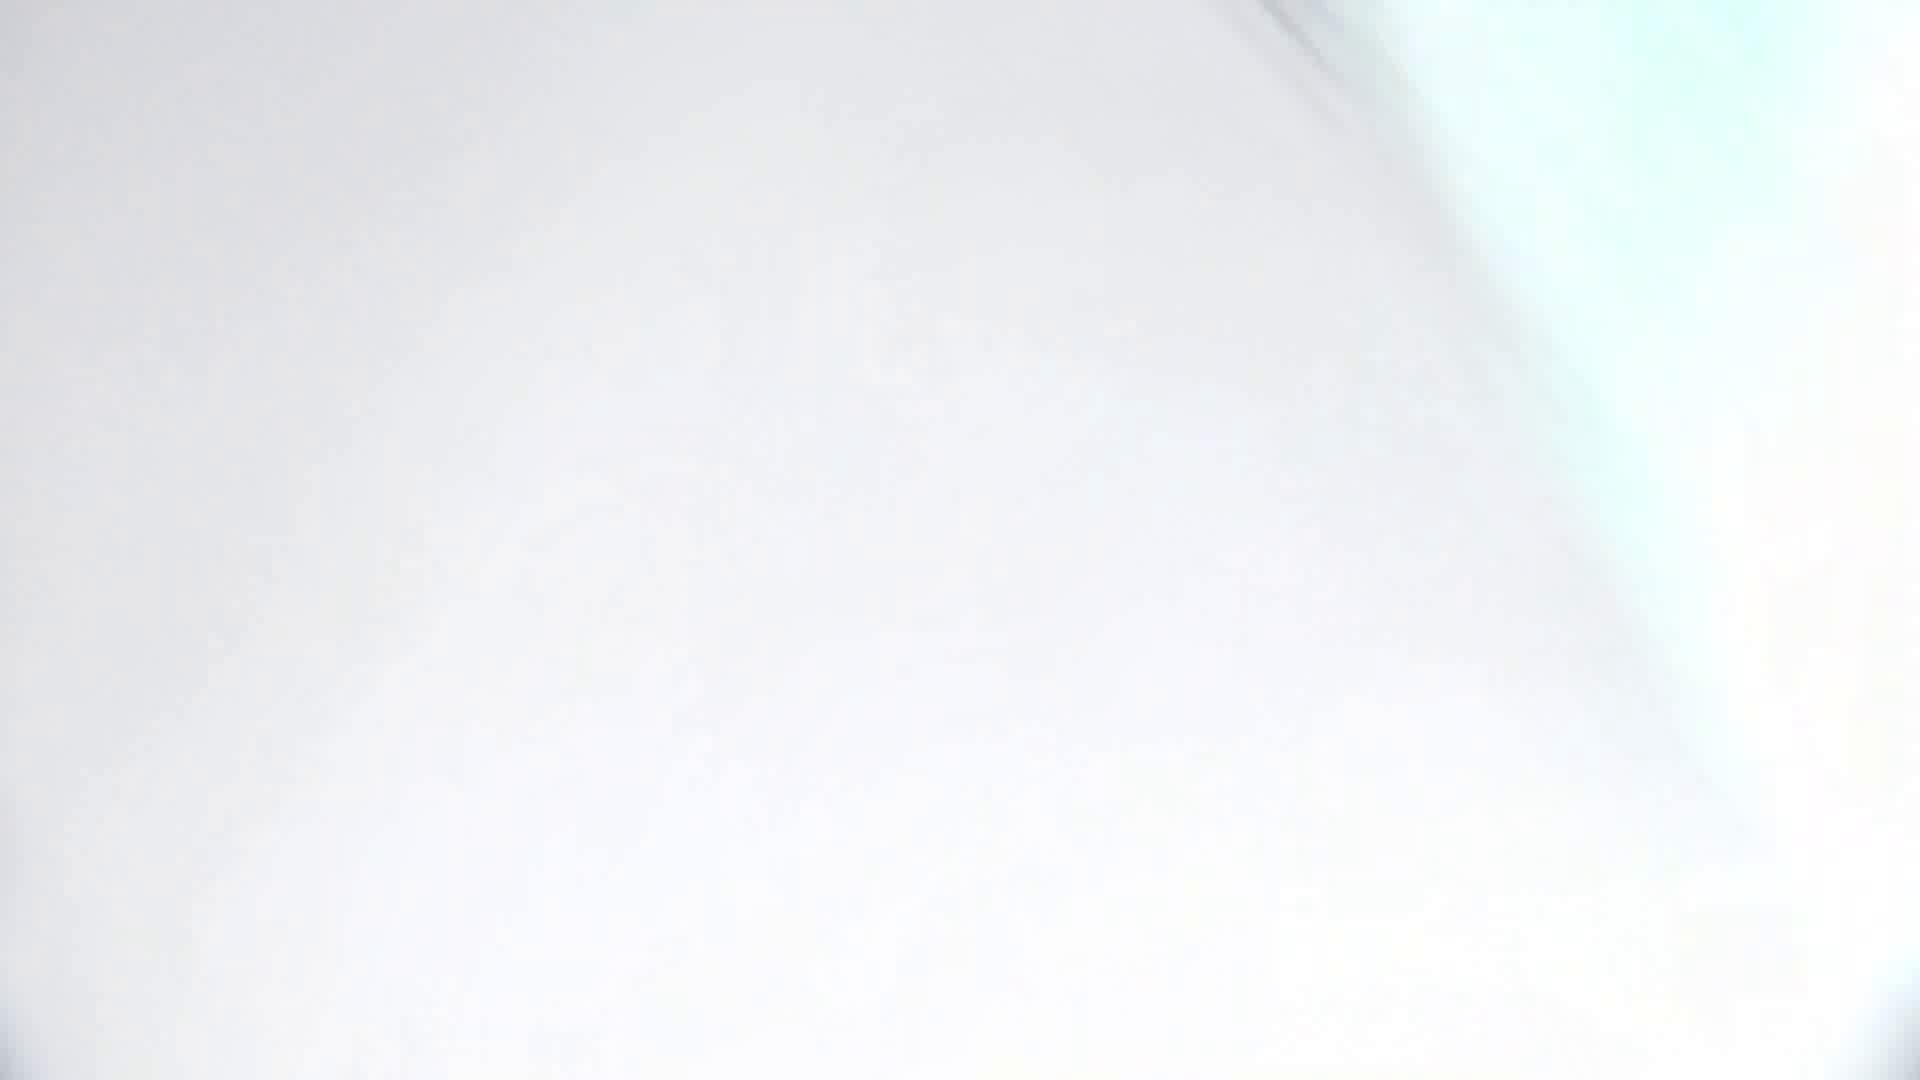 vol.25三十時間潜り、一つしか出会えない完璧桃尻編 byお銀 OL女体 スケベ動画紹介 61連発 35